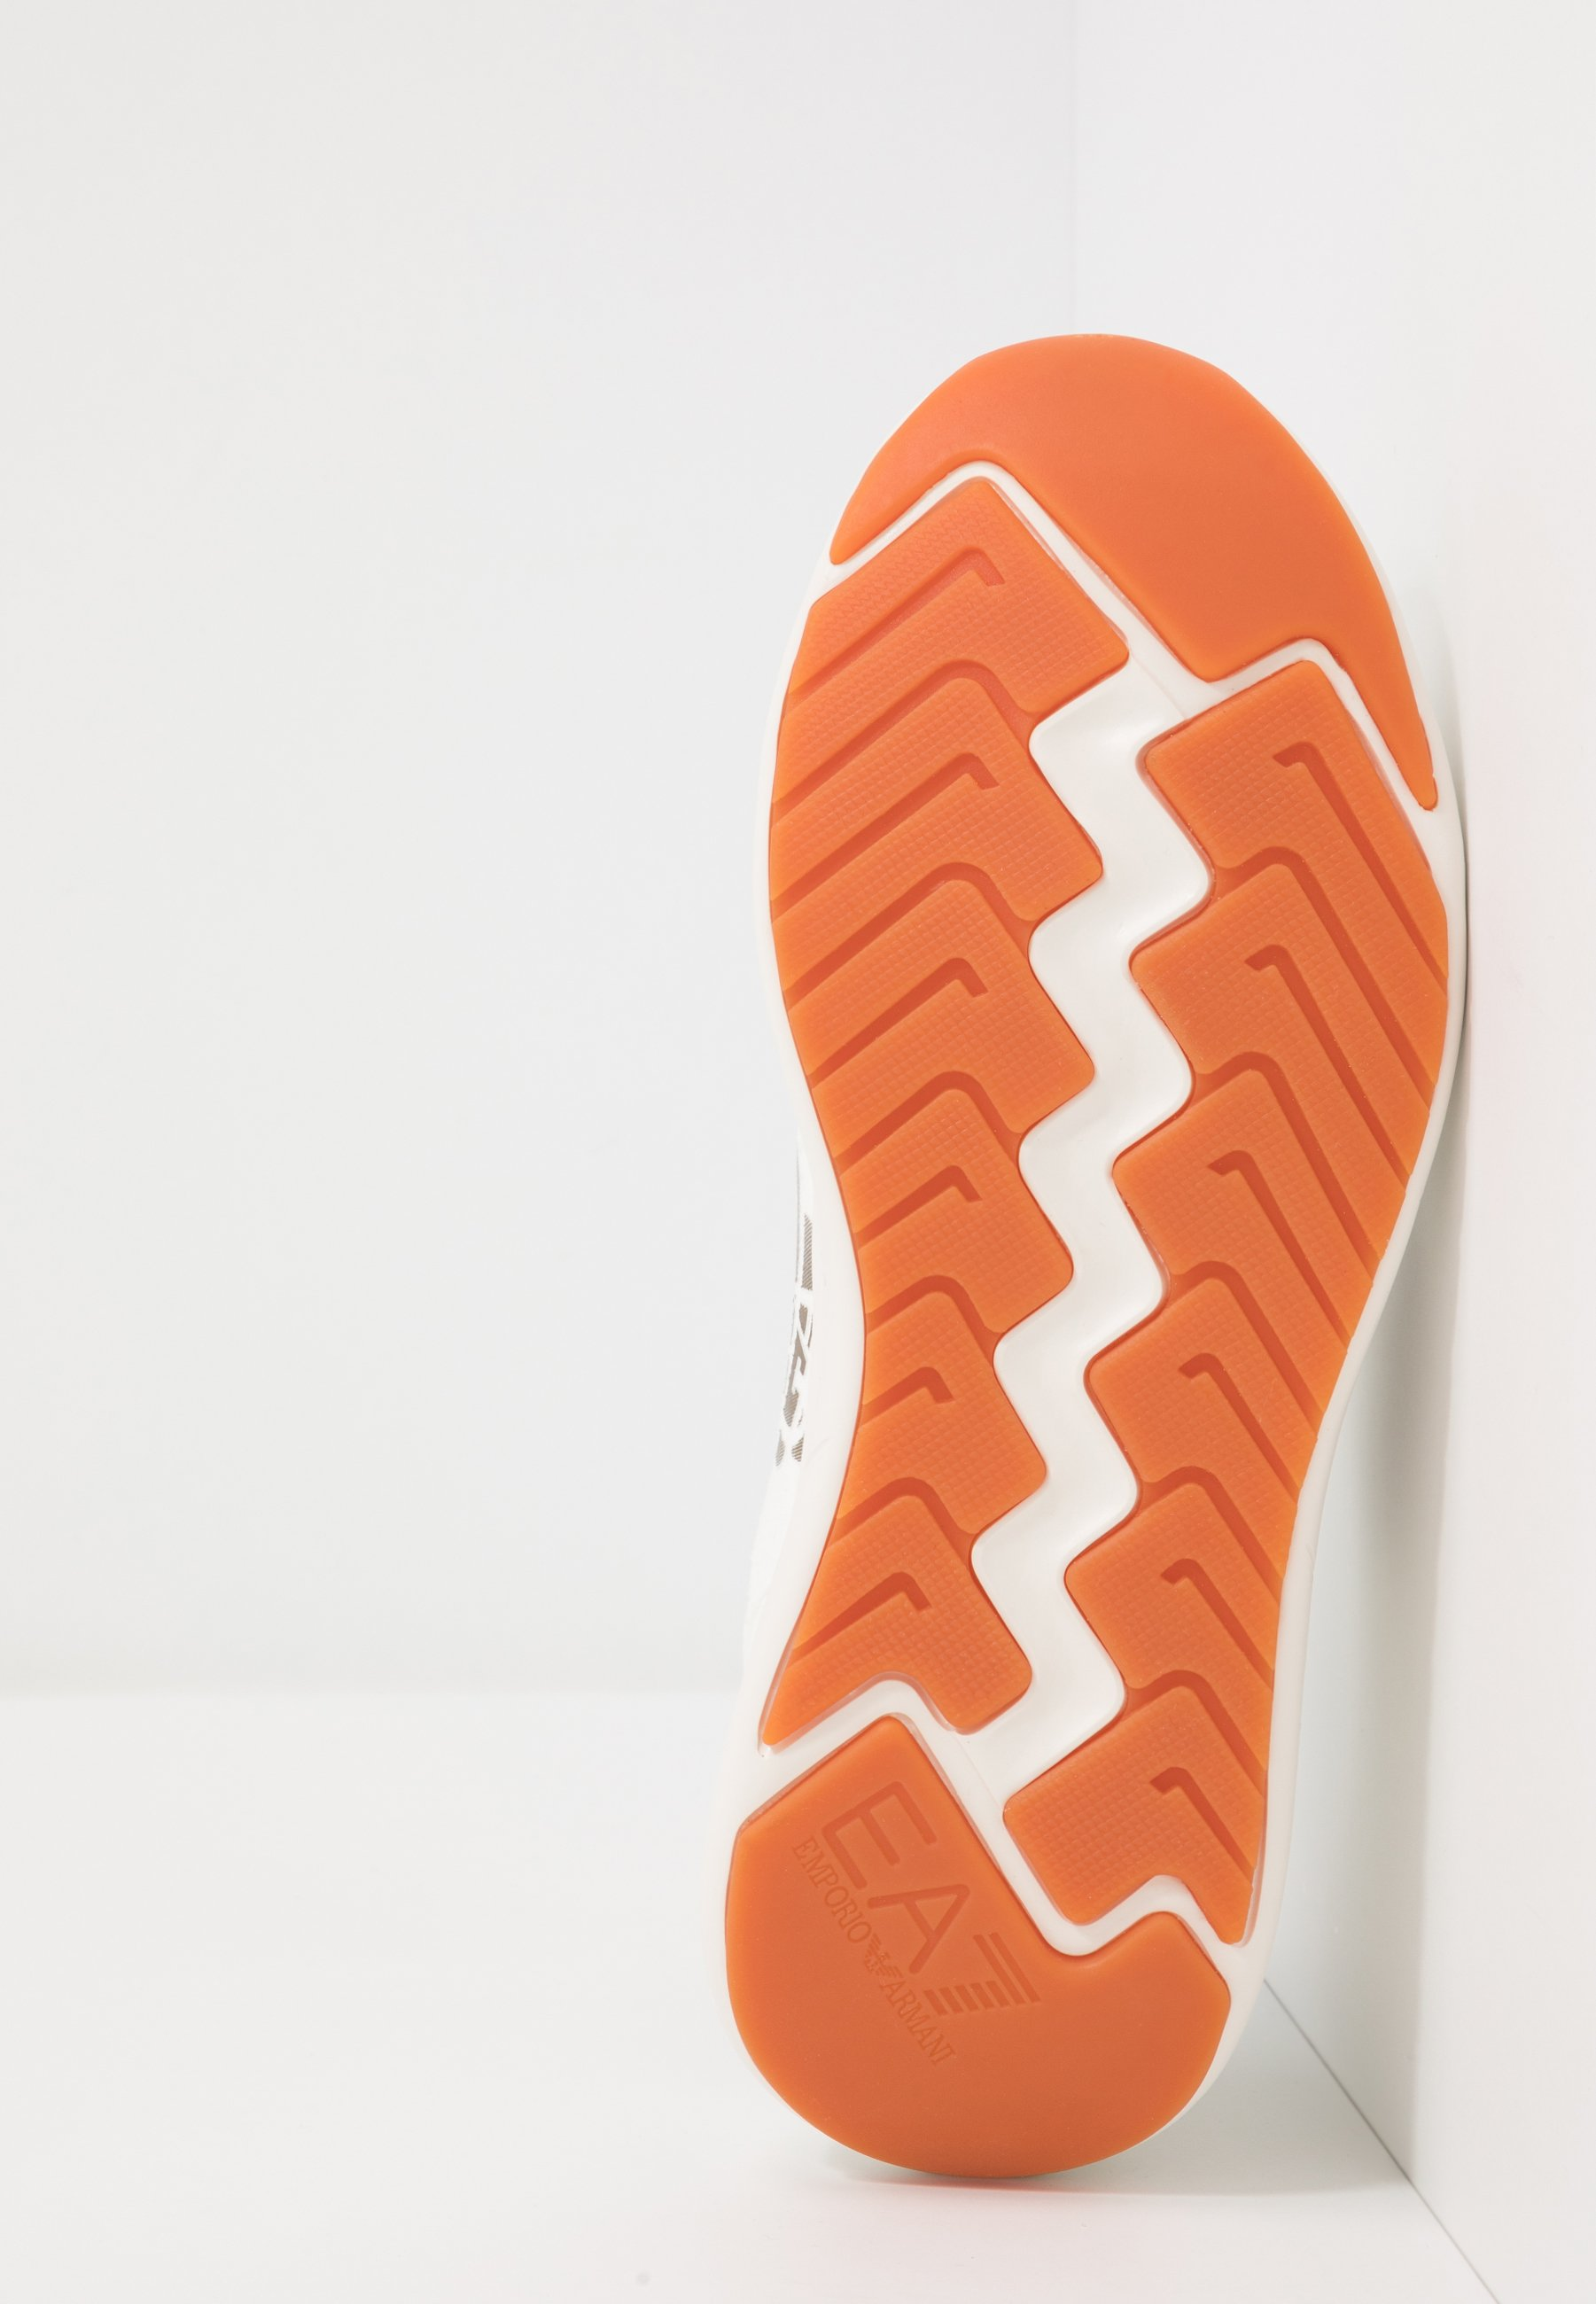 Ea7 Emporio Armani Sneakers - White